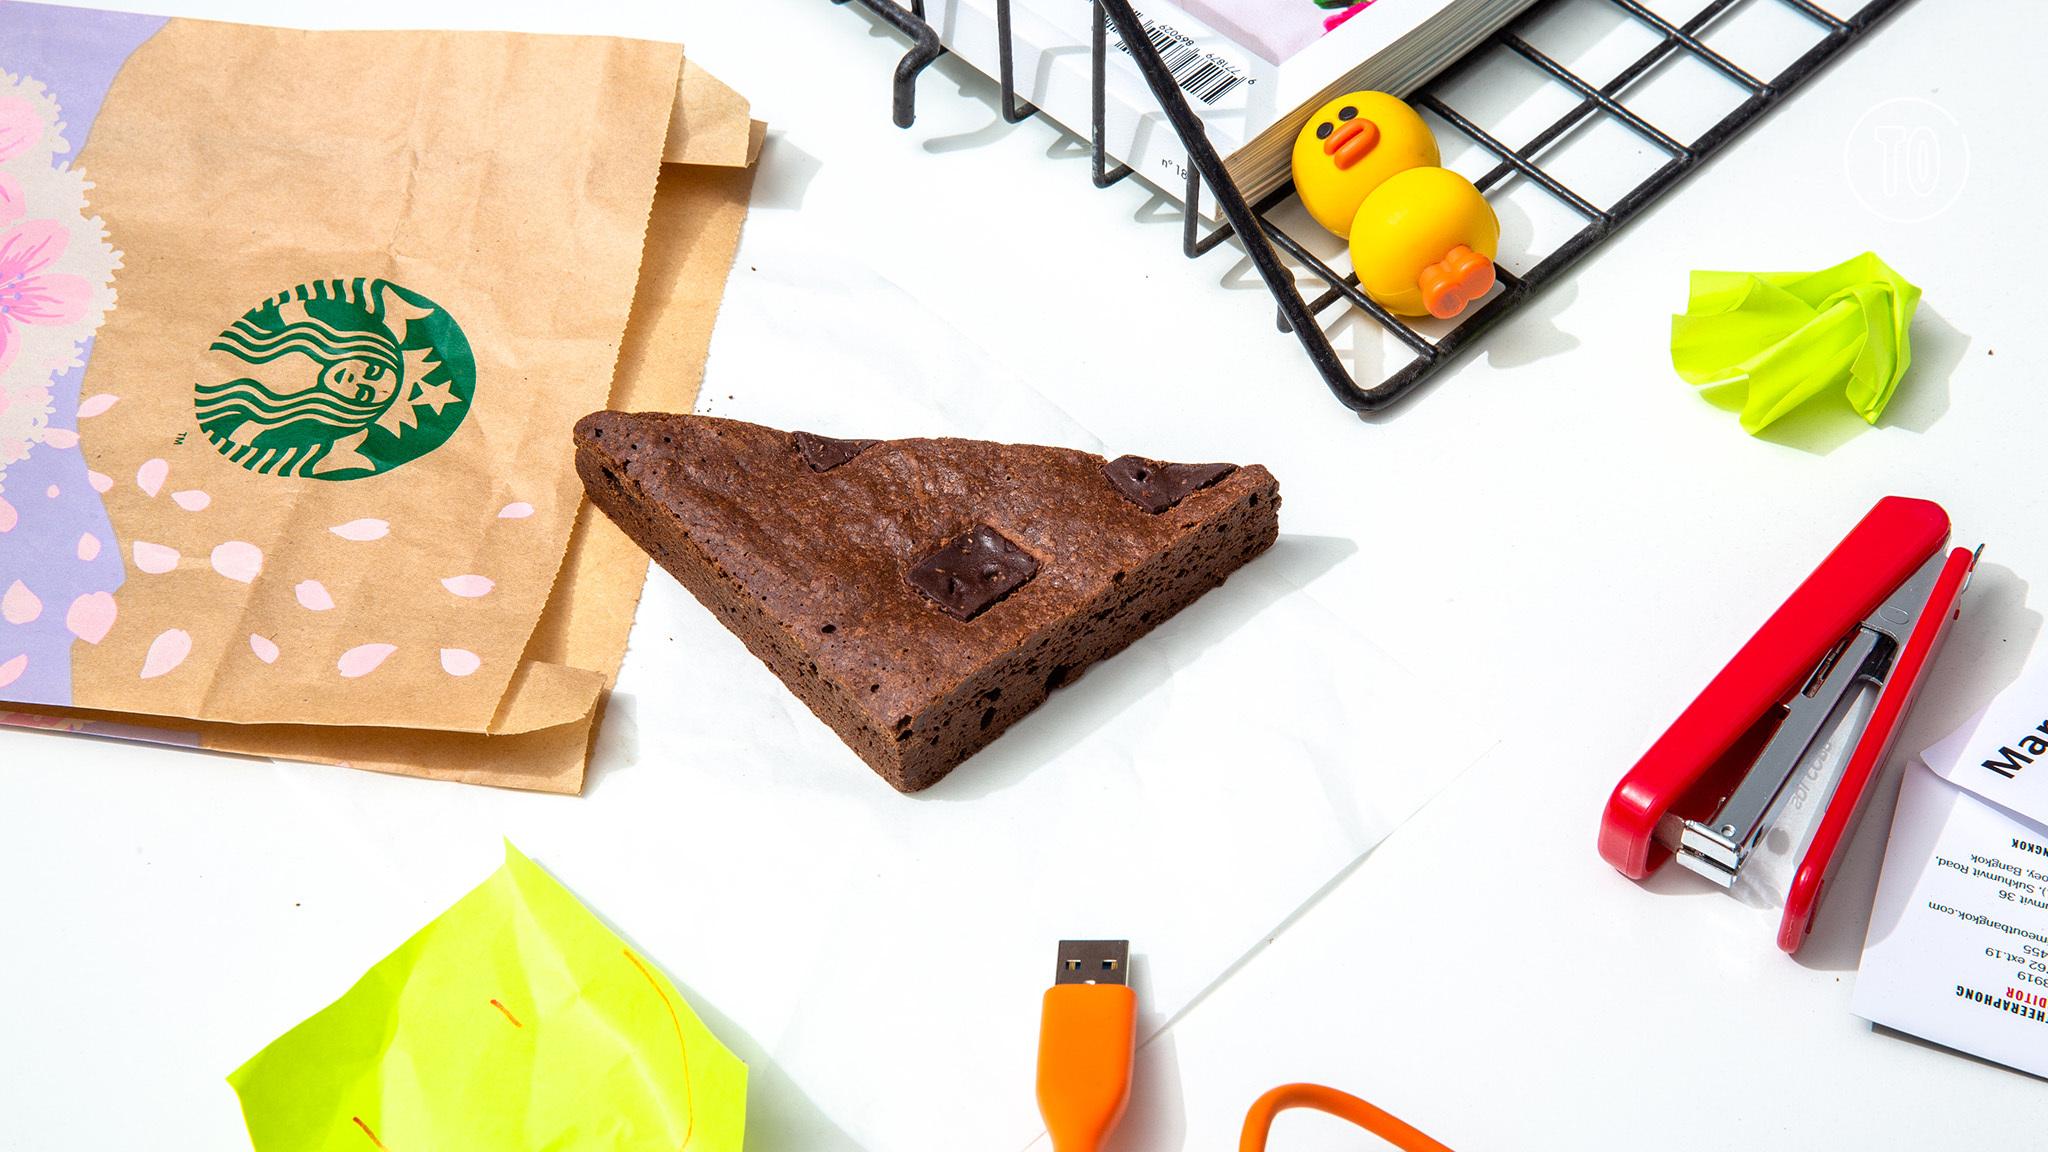 Starbucks brownie